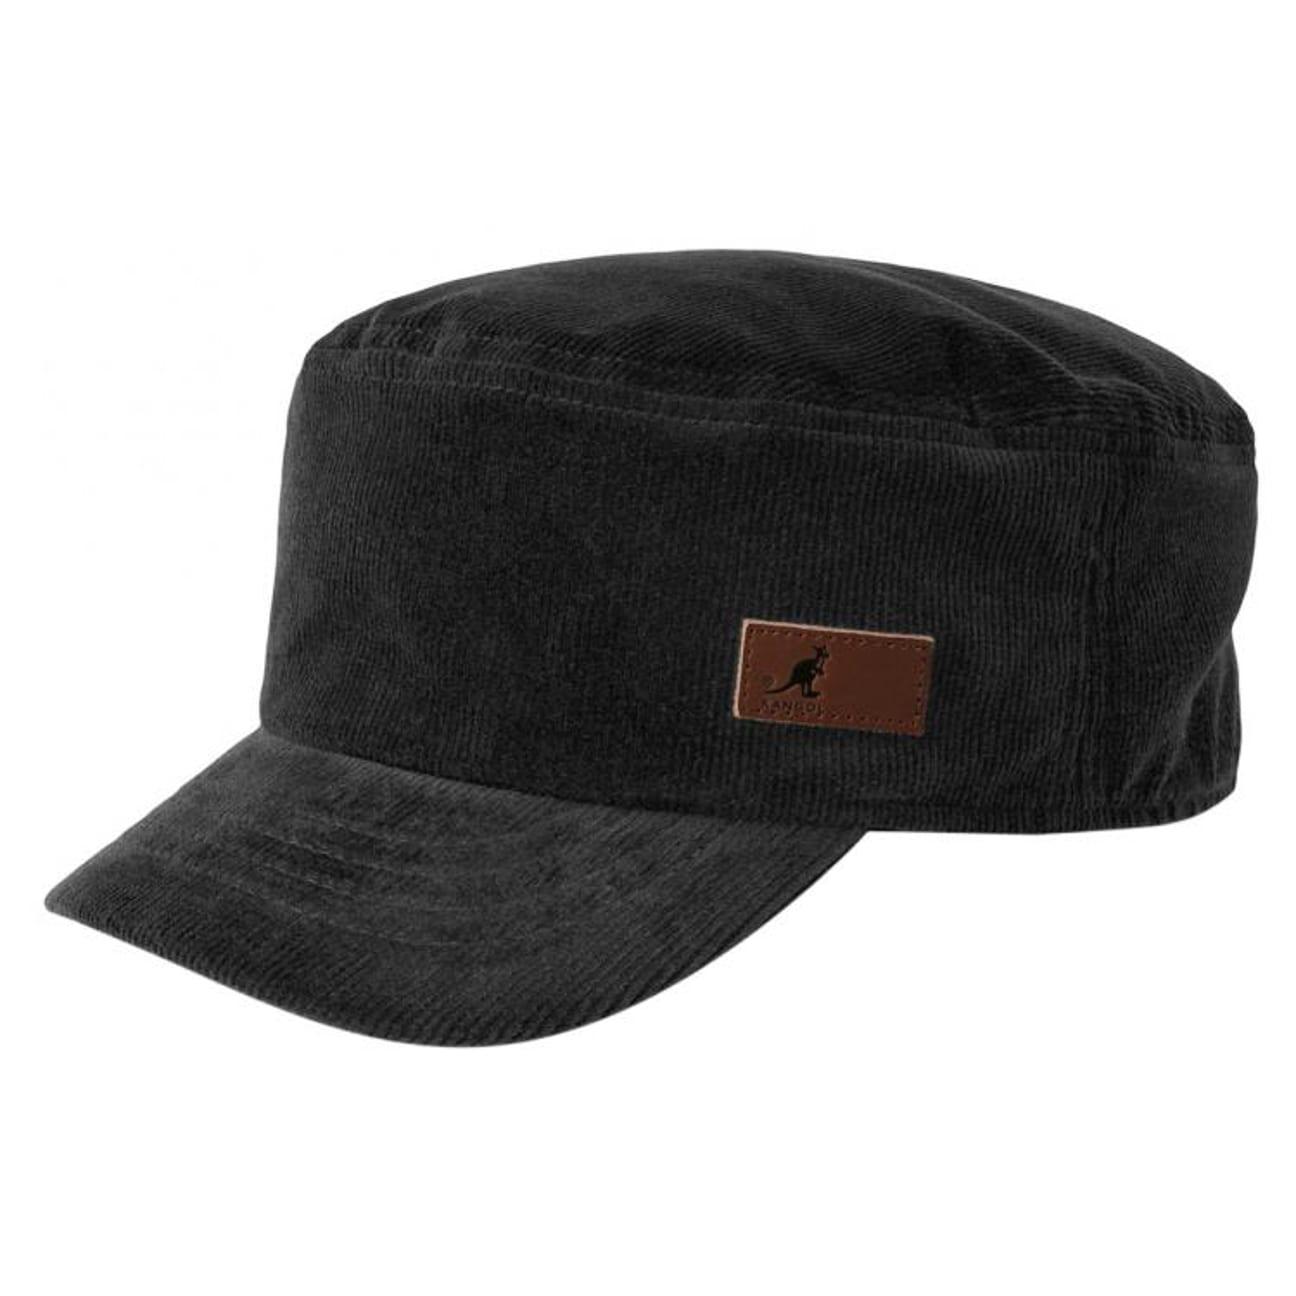 cord tau army cap by kangol eur 3300 gt hats caps